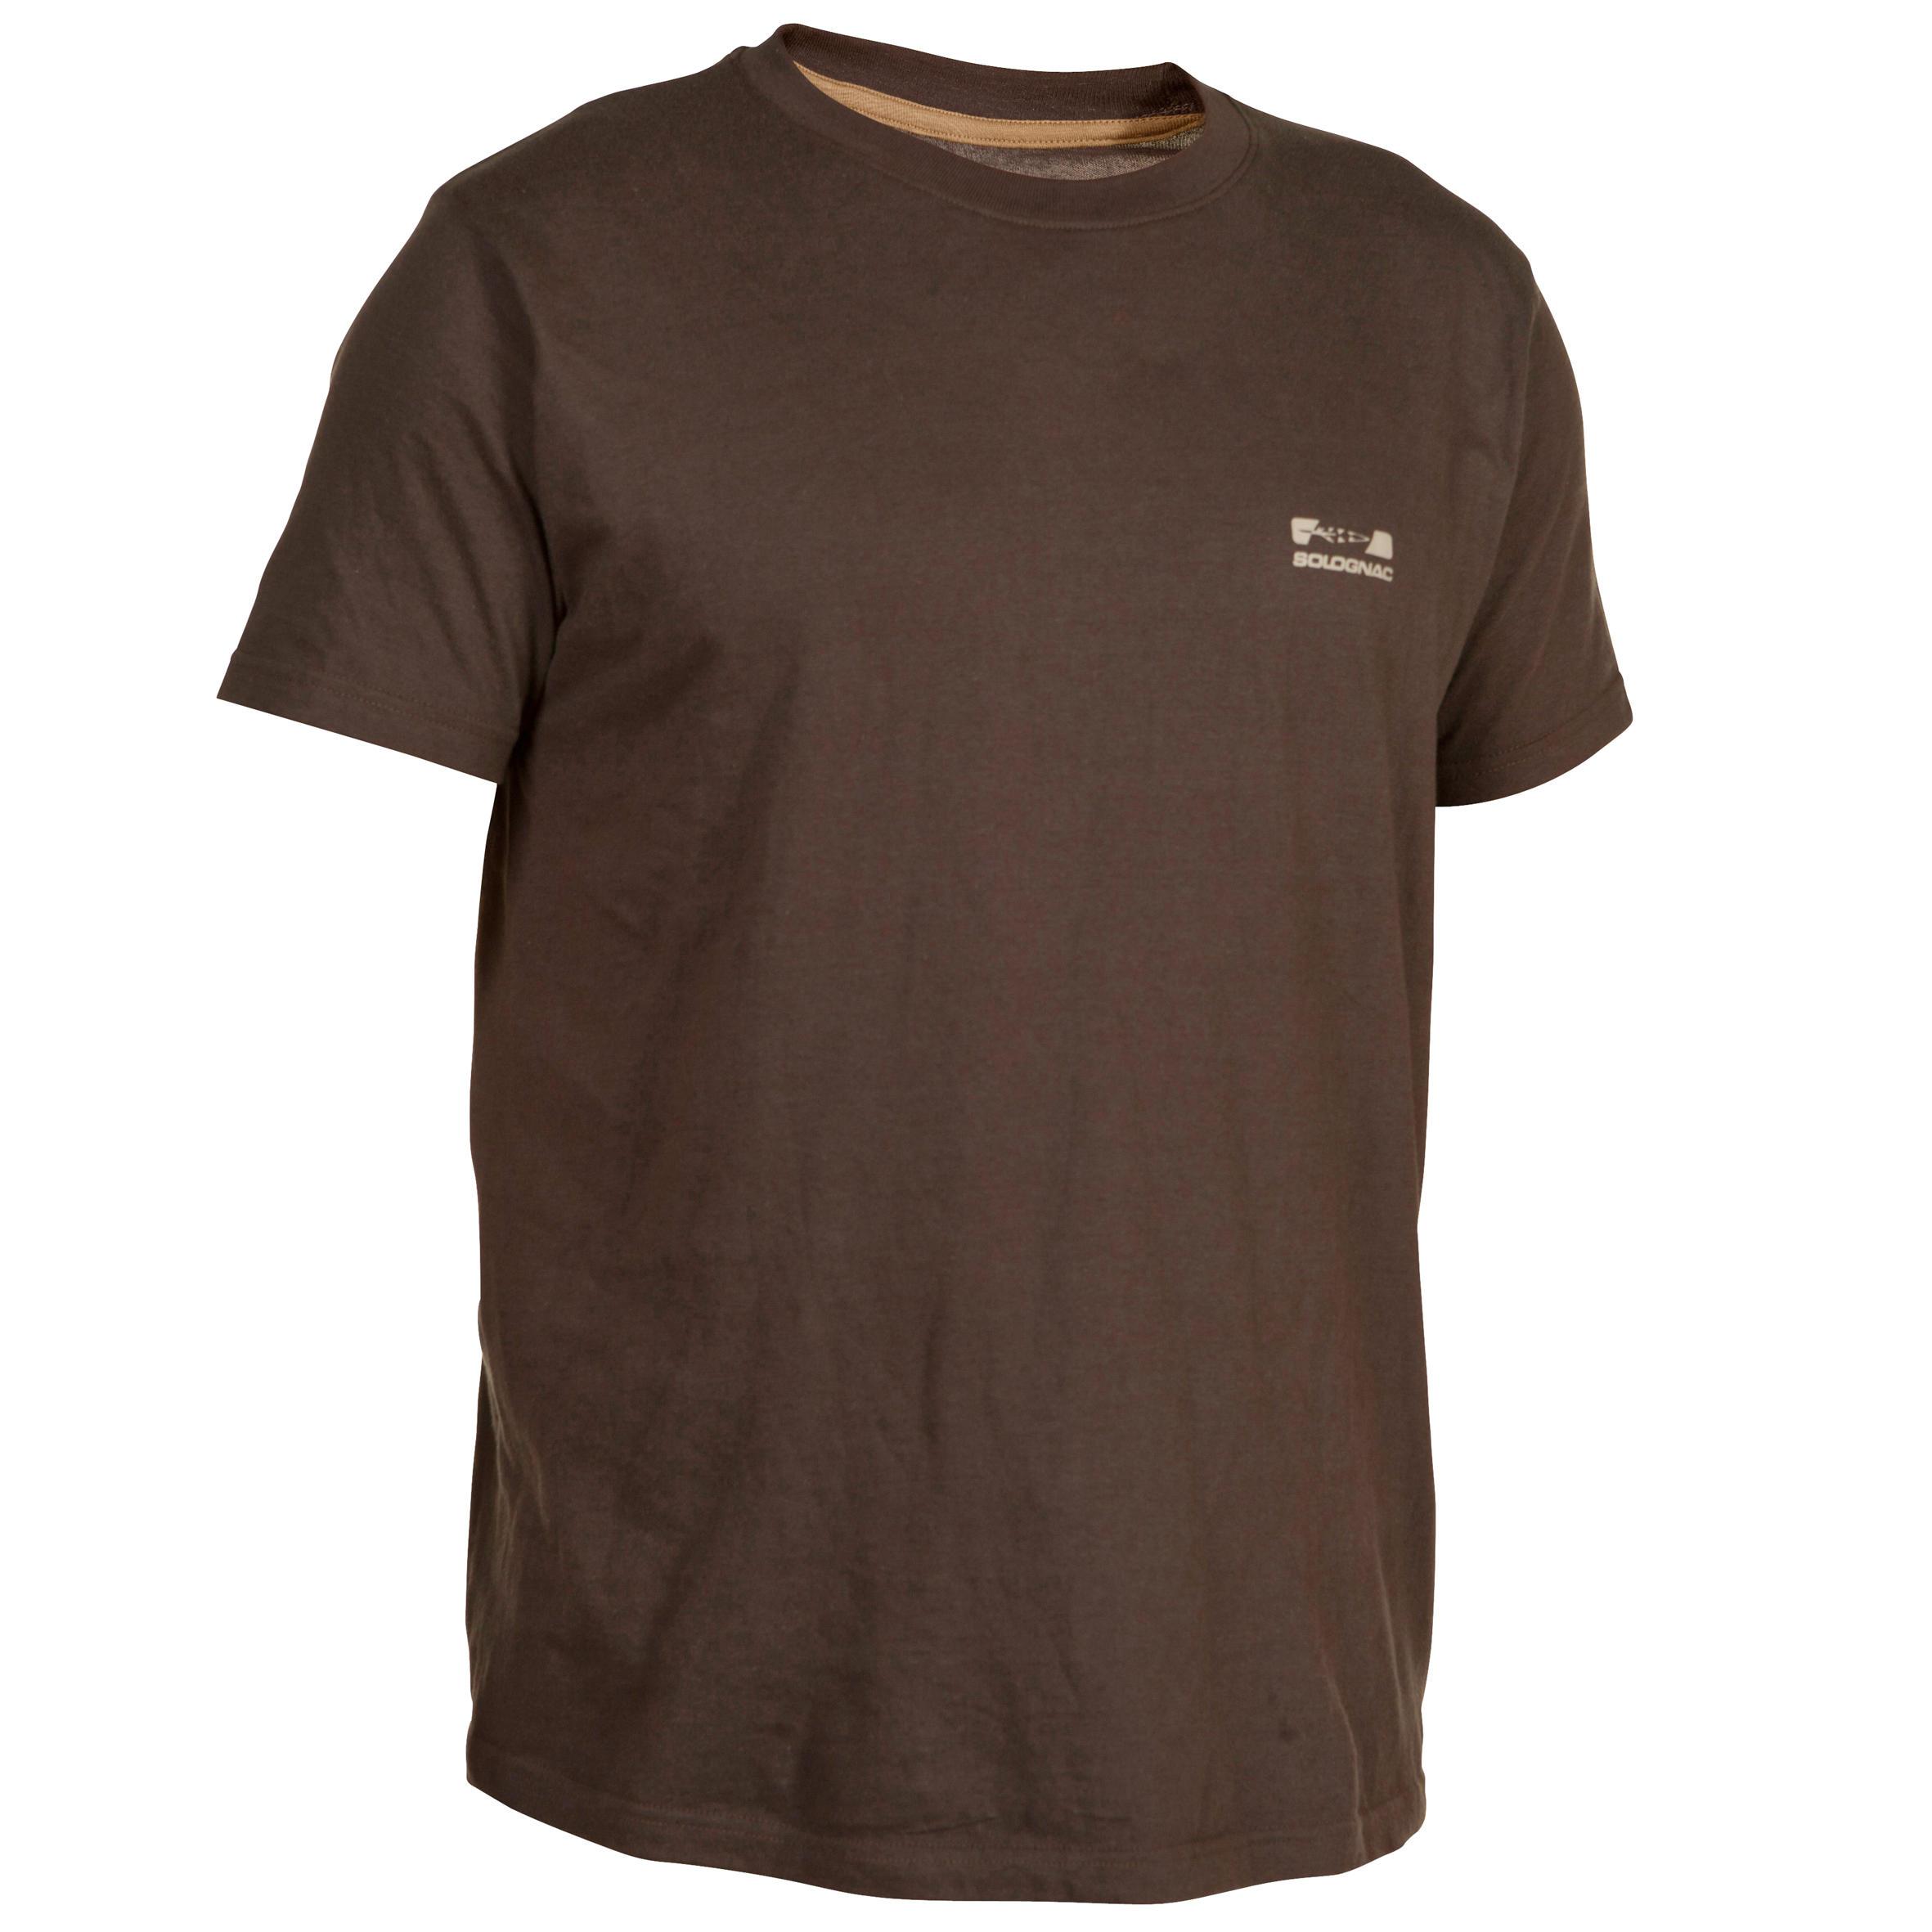 Solognac Tee shirt SG100 Korte mouwen DSH